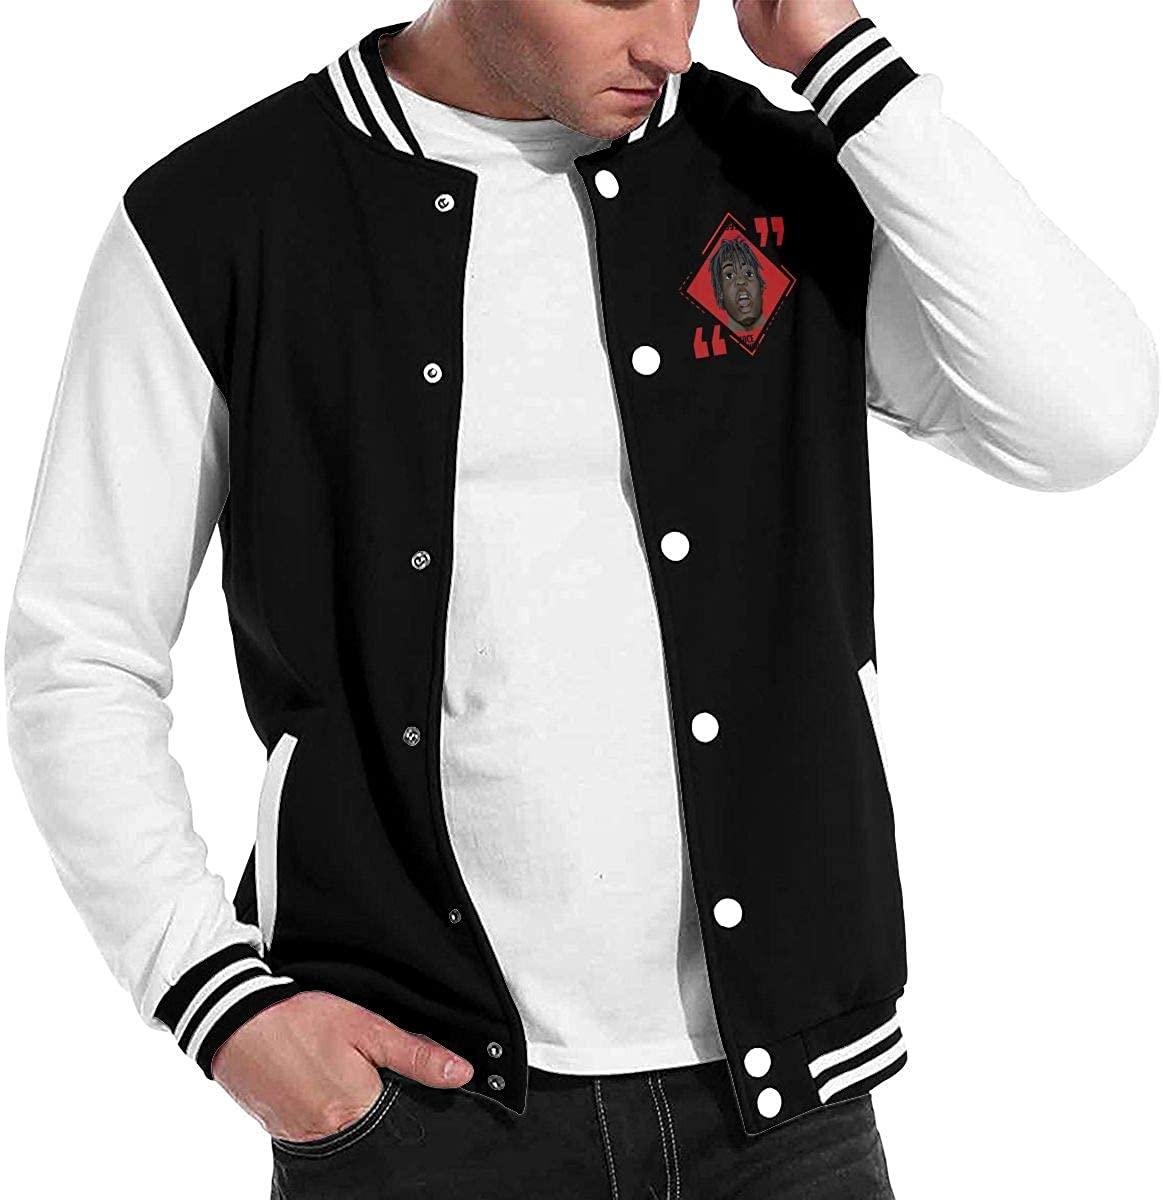 NOT Juice WRLD Men's Fashion Sweatshirt Comfortable Baseball Uniform Black